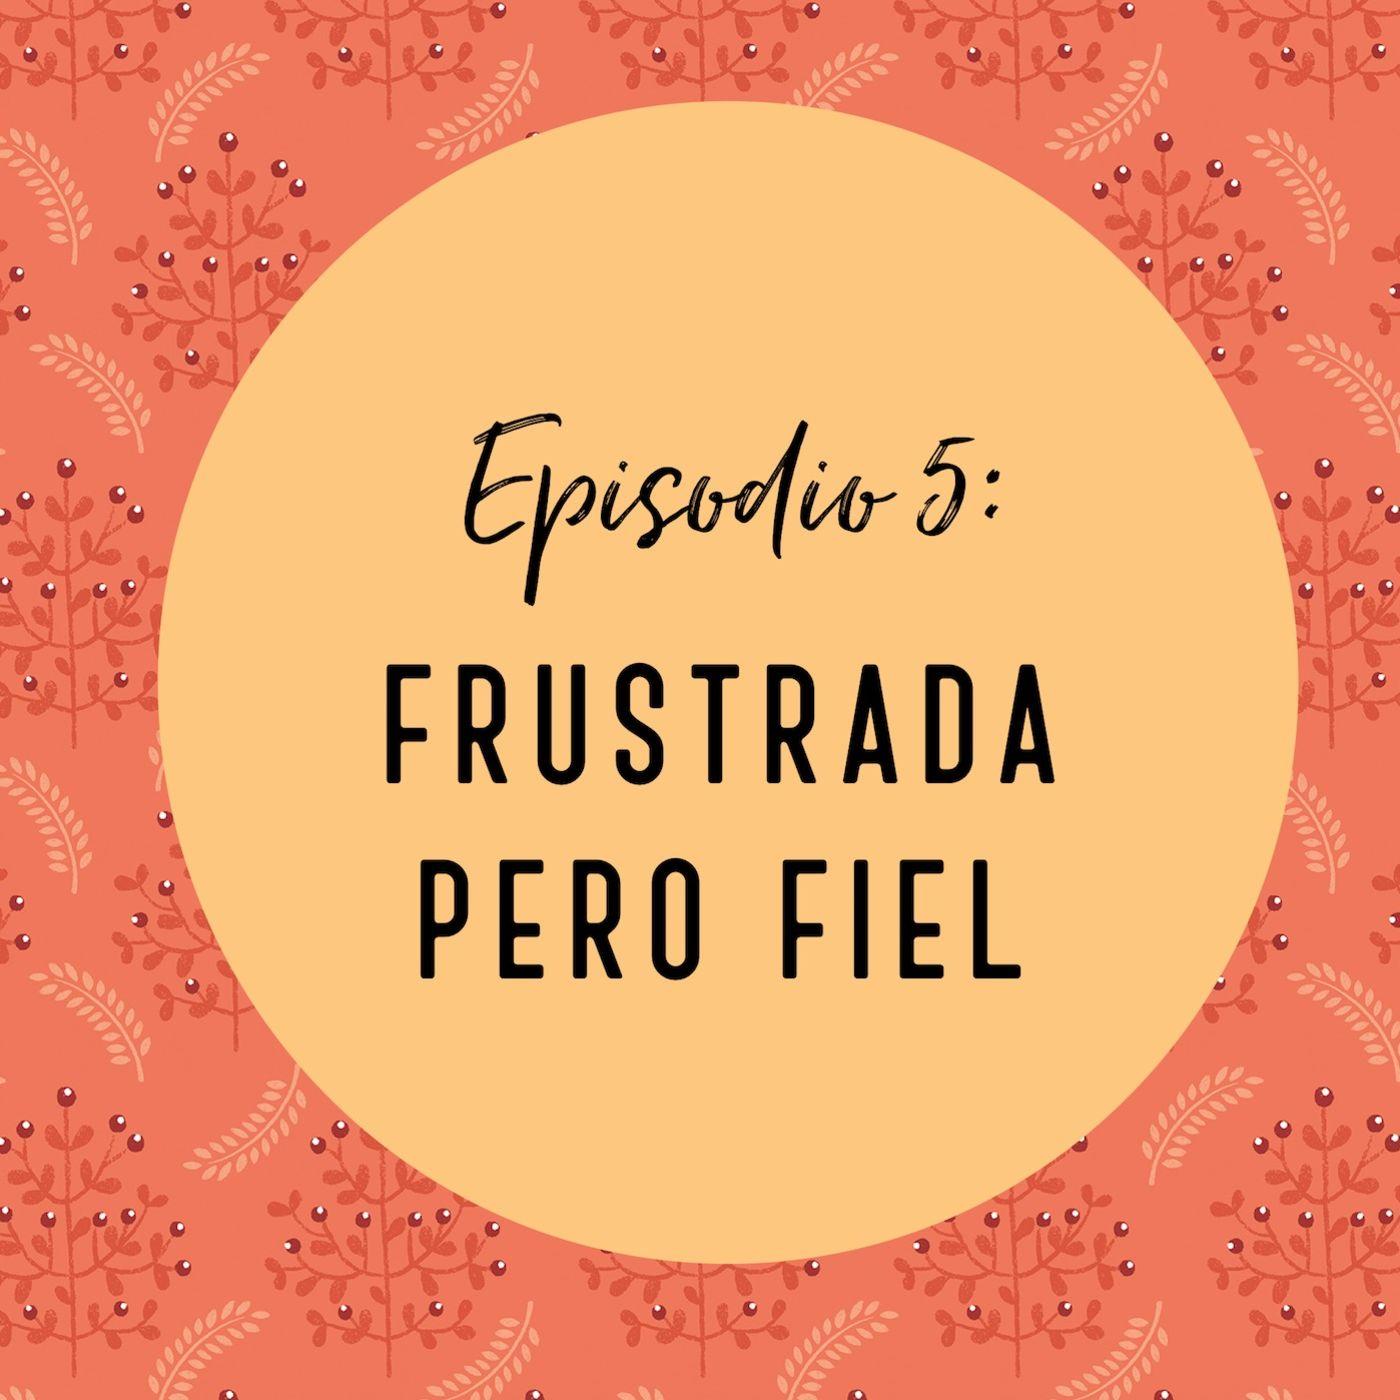 Episodio 5: Frustrada Pero Fiel